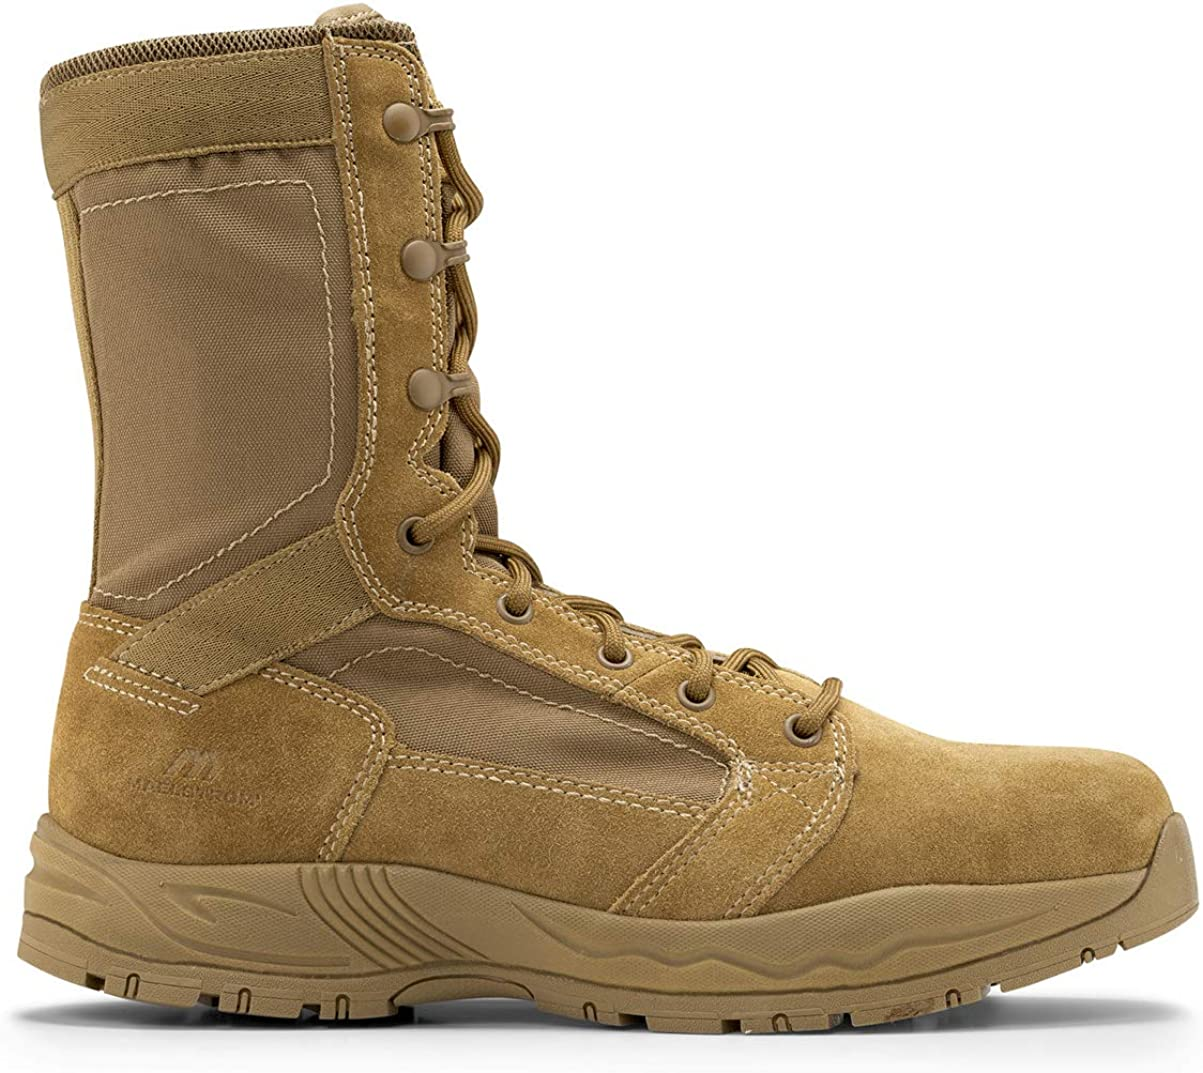 Maelstrom Mil Bombing new work Lite Men's 9'' Coyote Boot 670-1 Brown Houston Mall AR Military